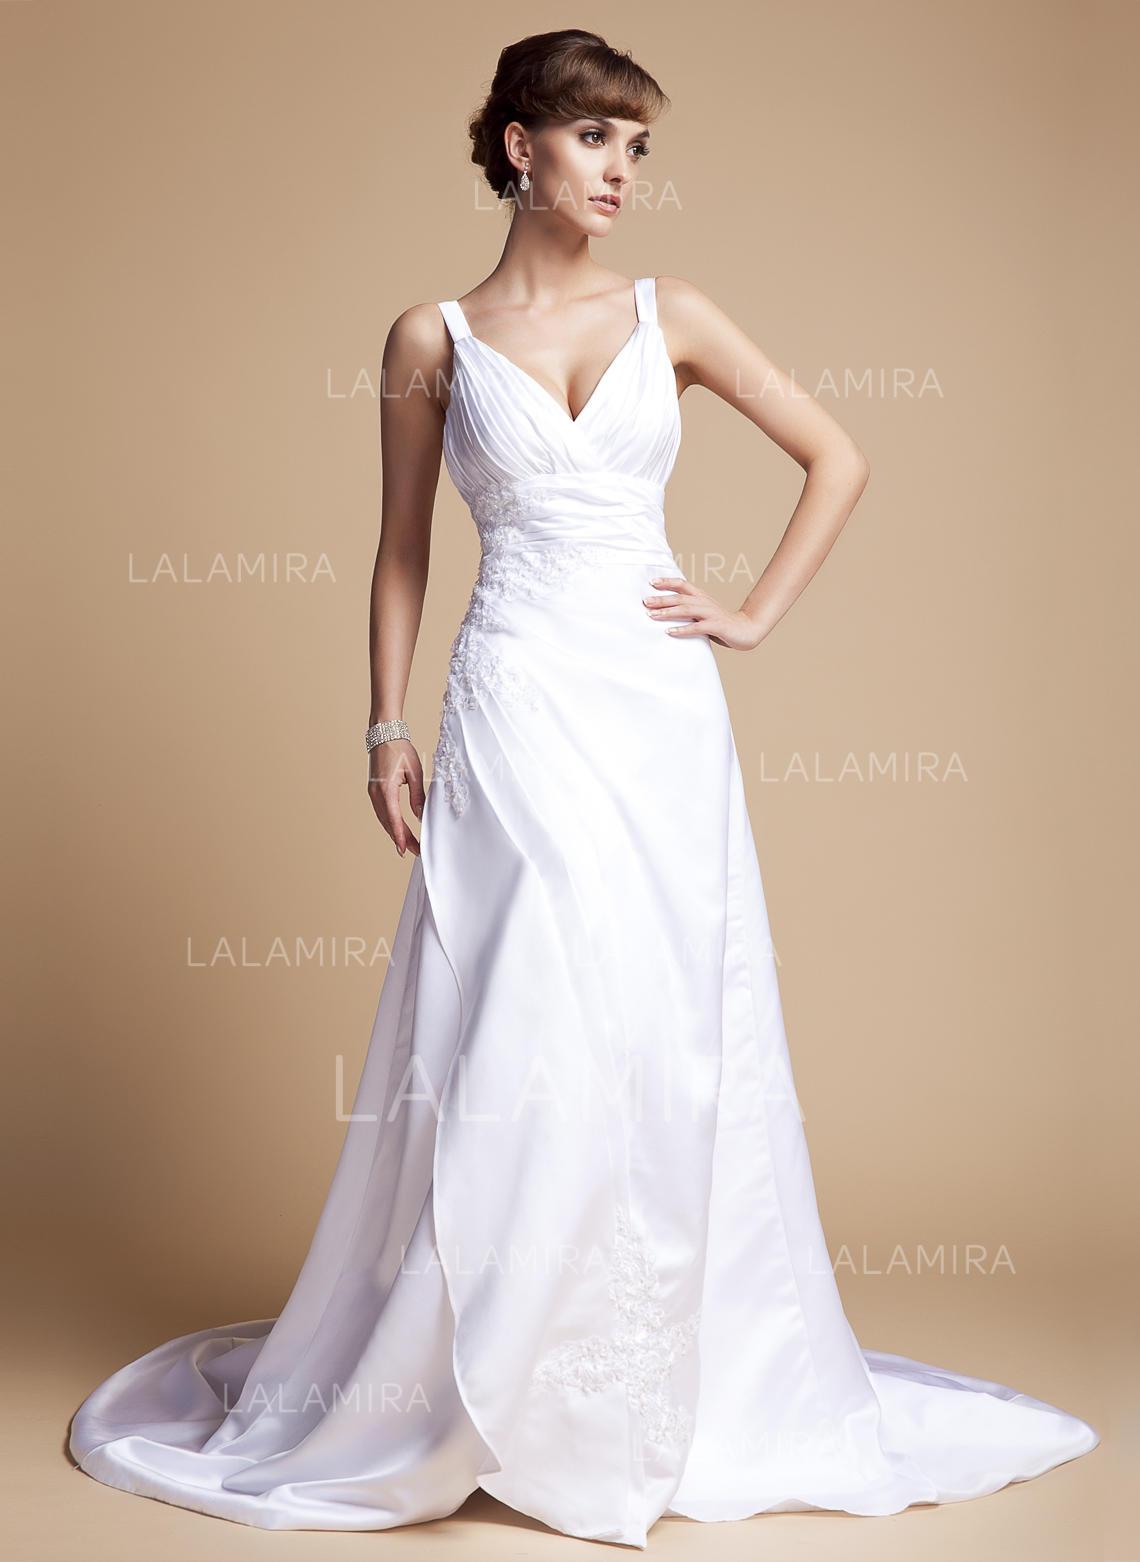 Sweetheart A-Line Princess Wedding Dresses Satin Ruffle Beading Appliques  Lace Sleeveless Court Train. Loading zoom 2d2ba94a1